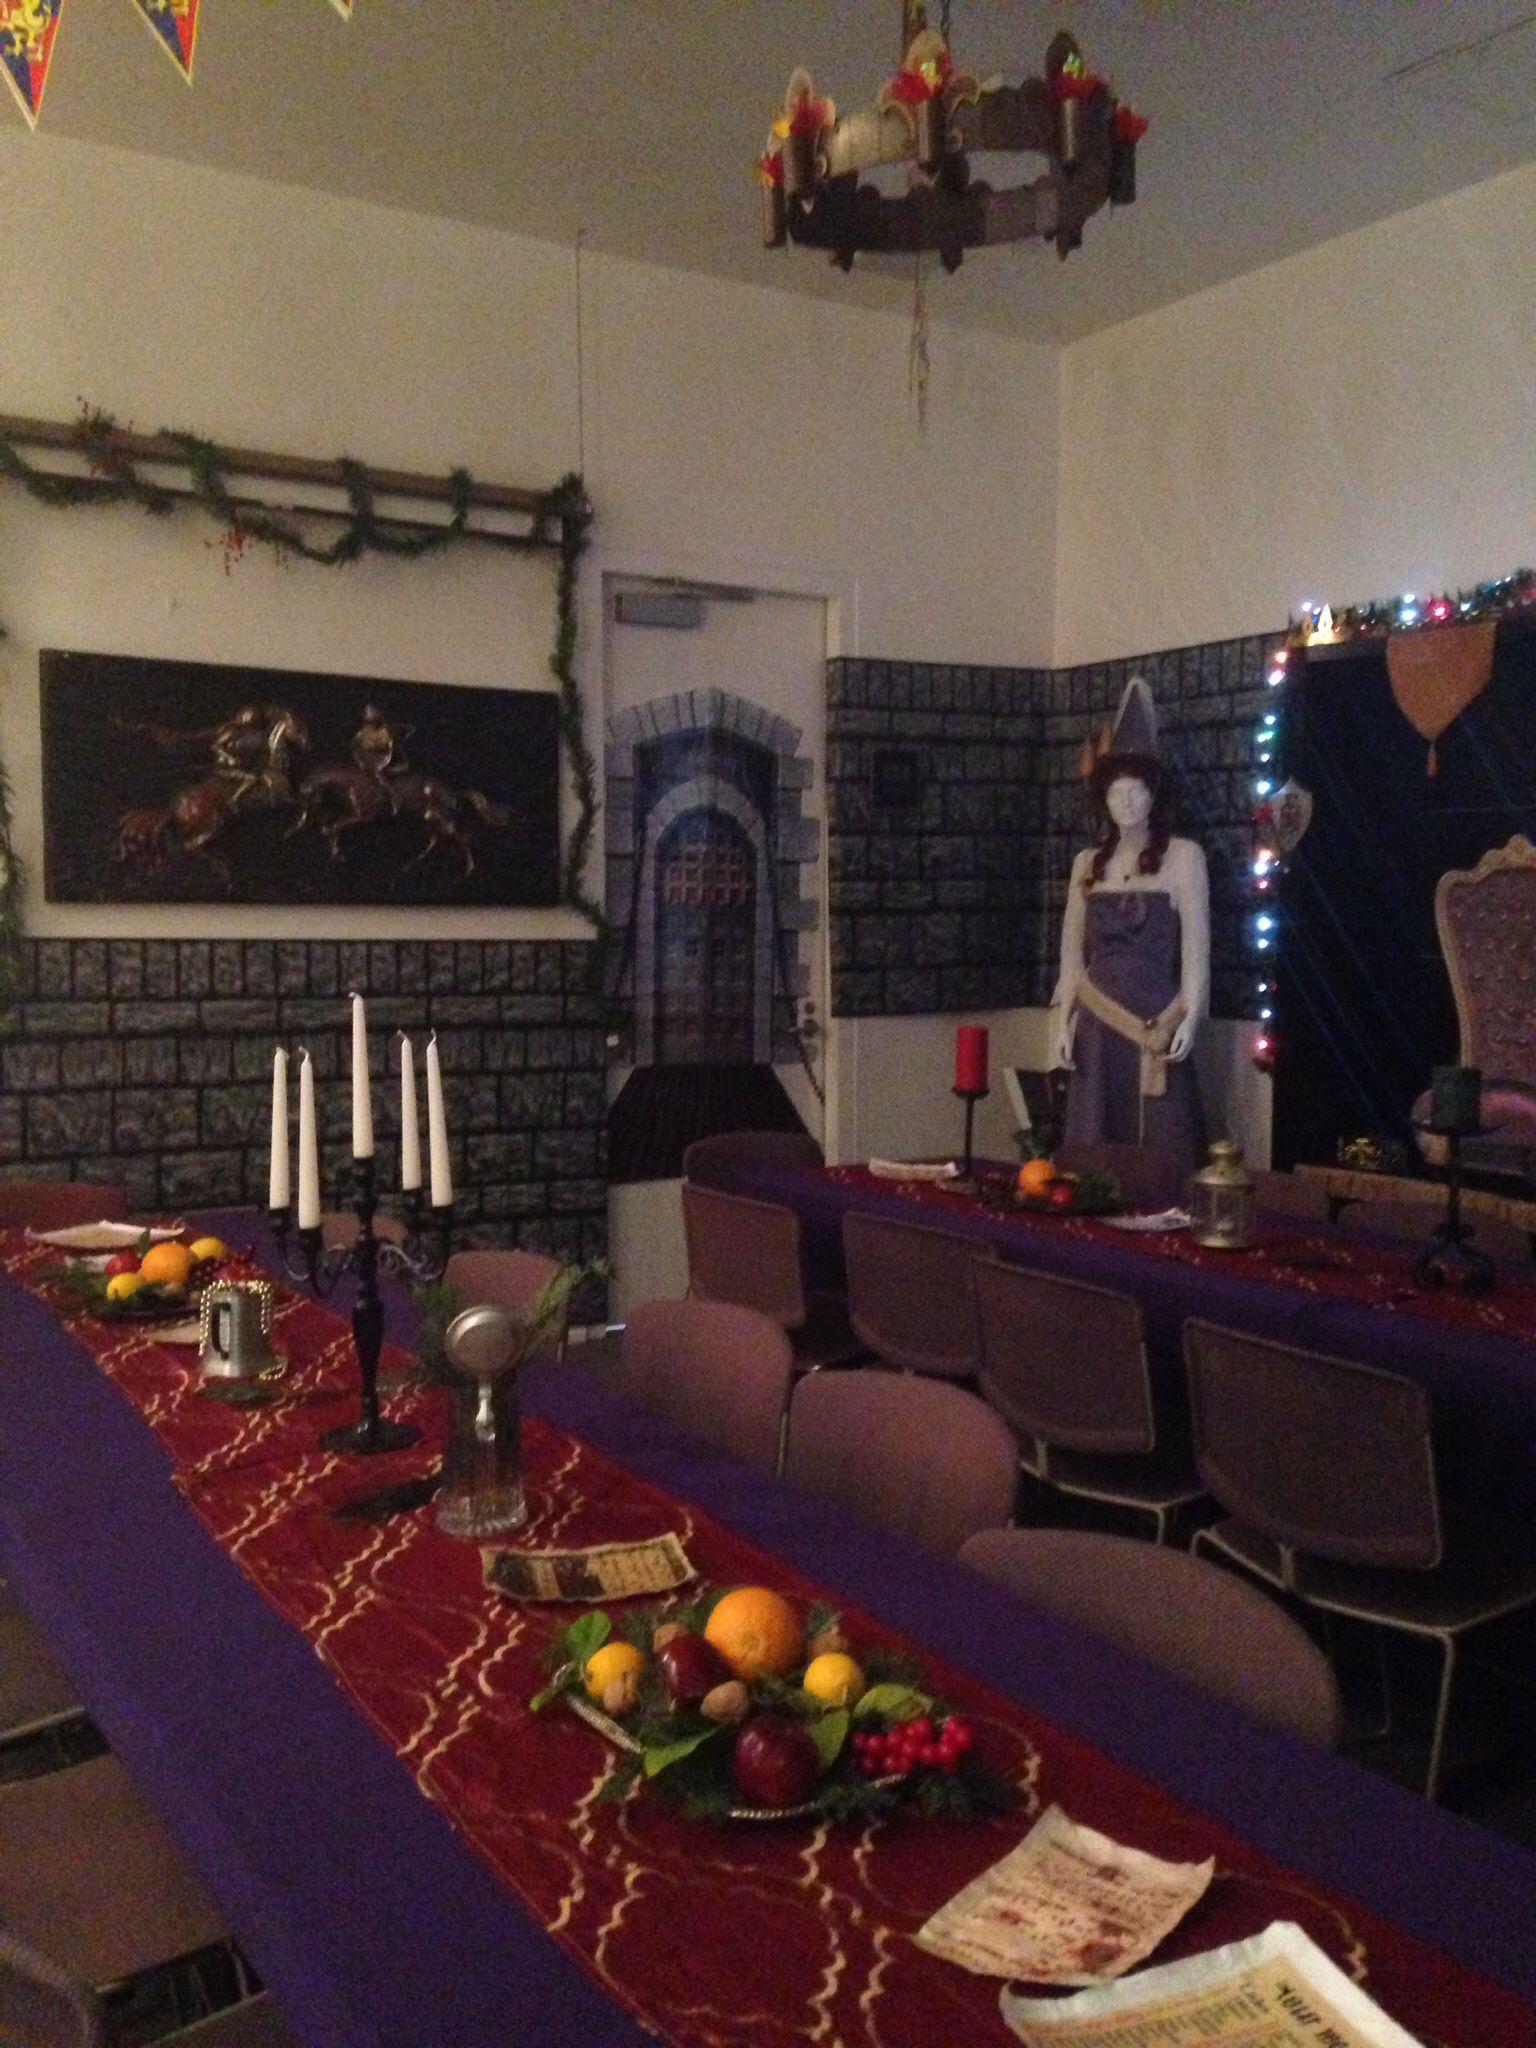 Xmas Wedding Table Decorations